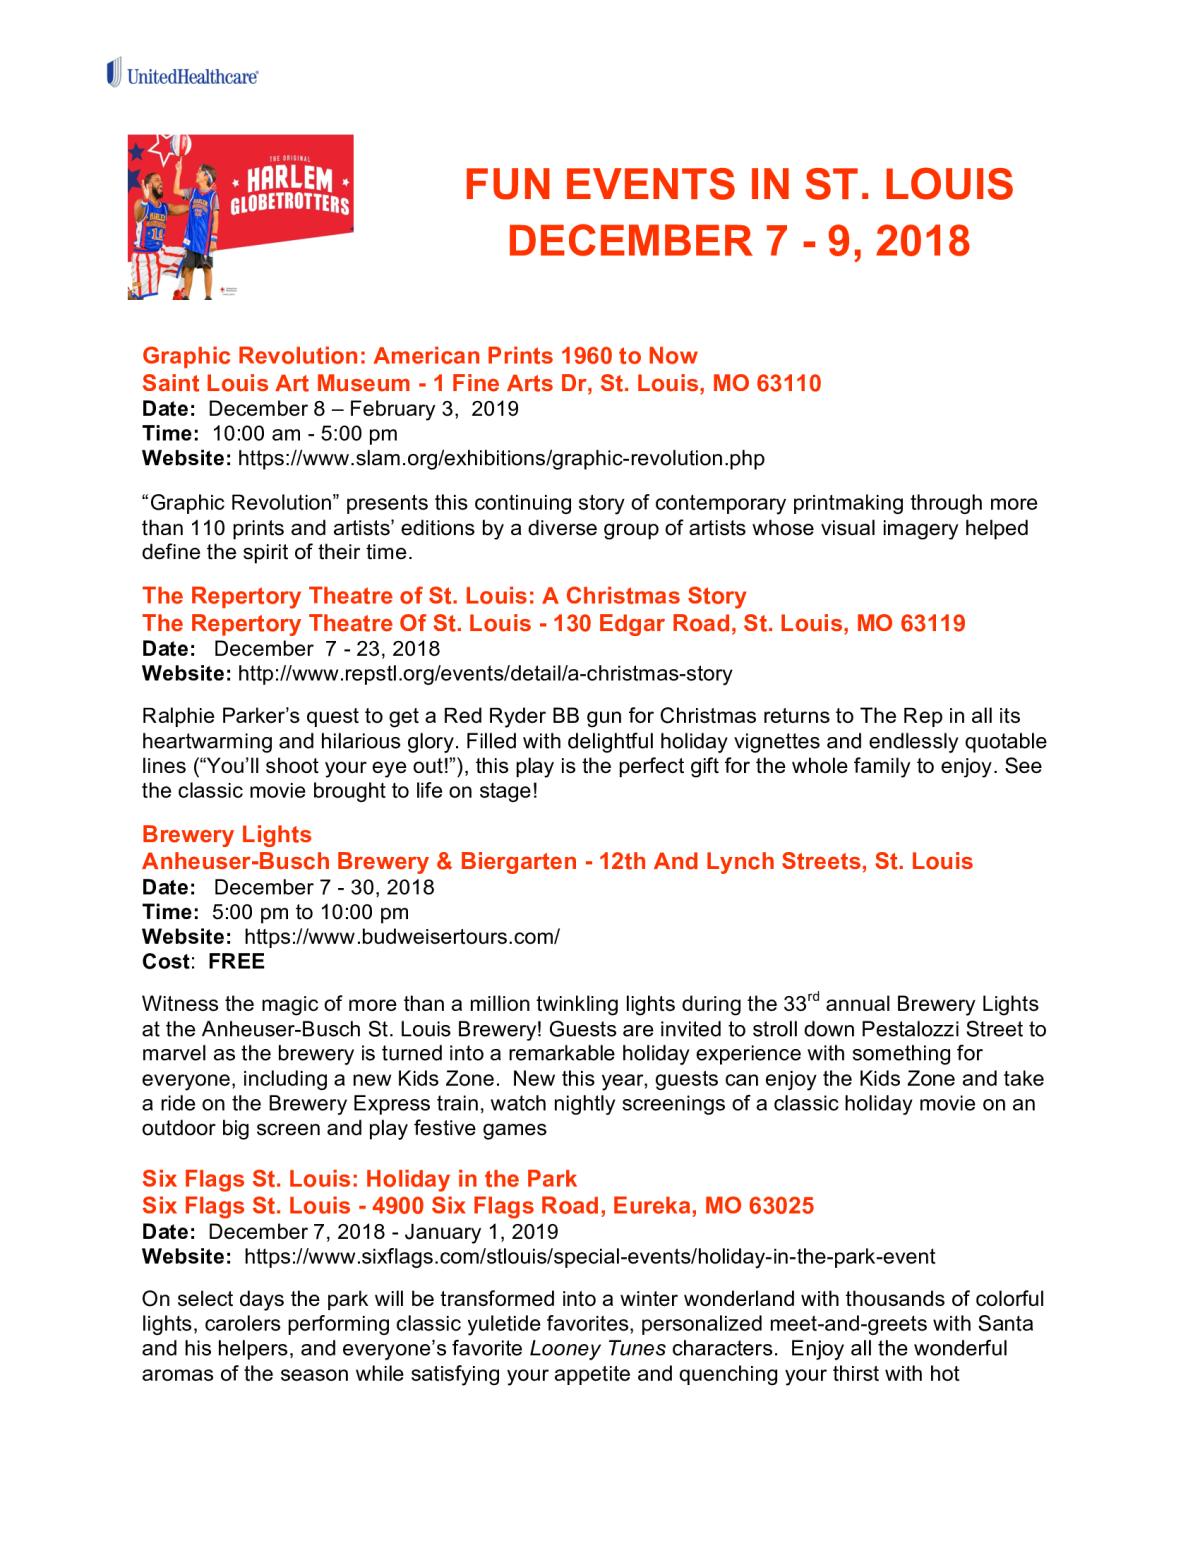 Christmas Events In St Louis 2019 Peachjar Flyers